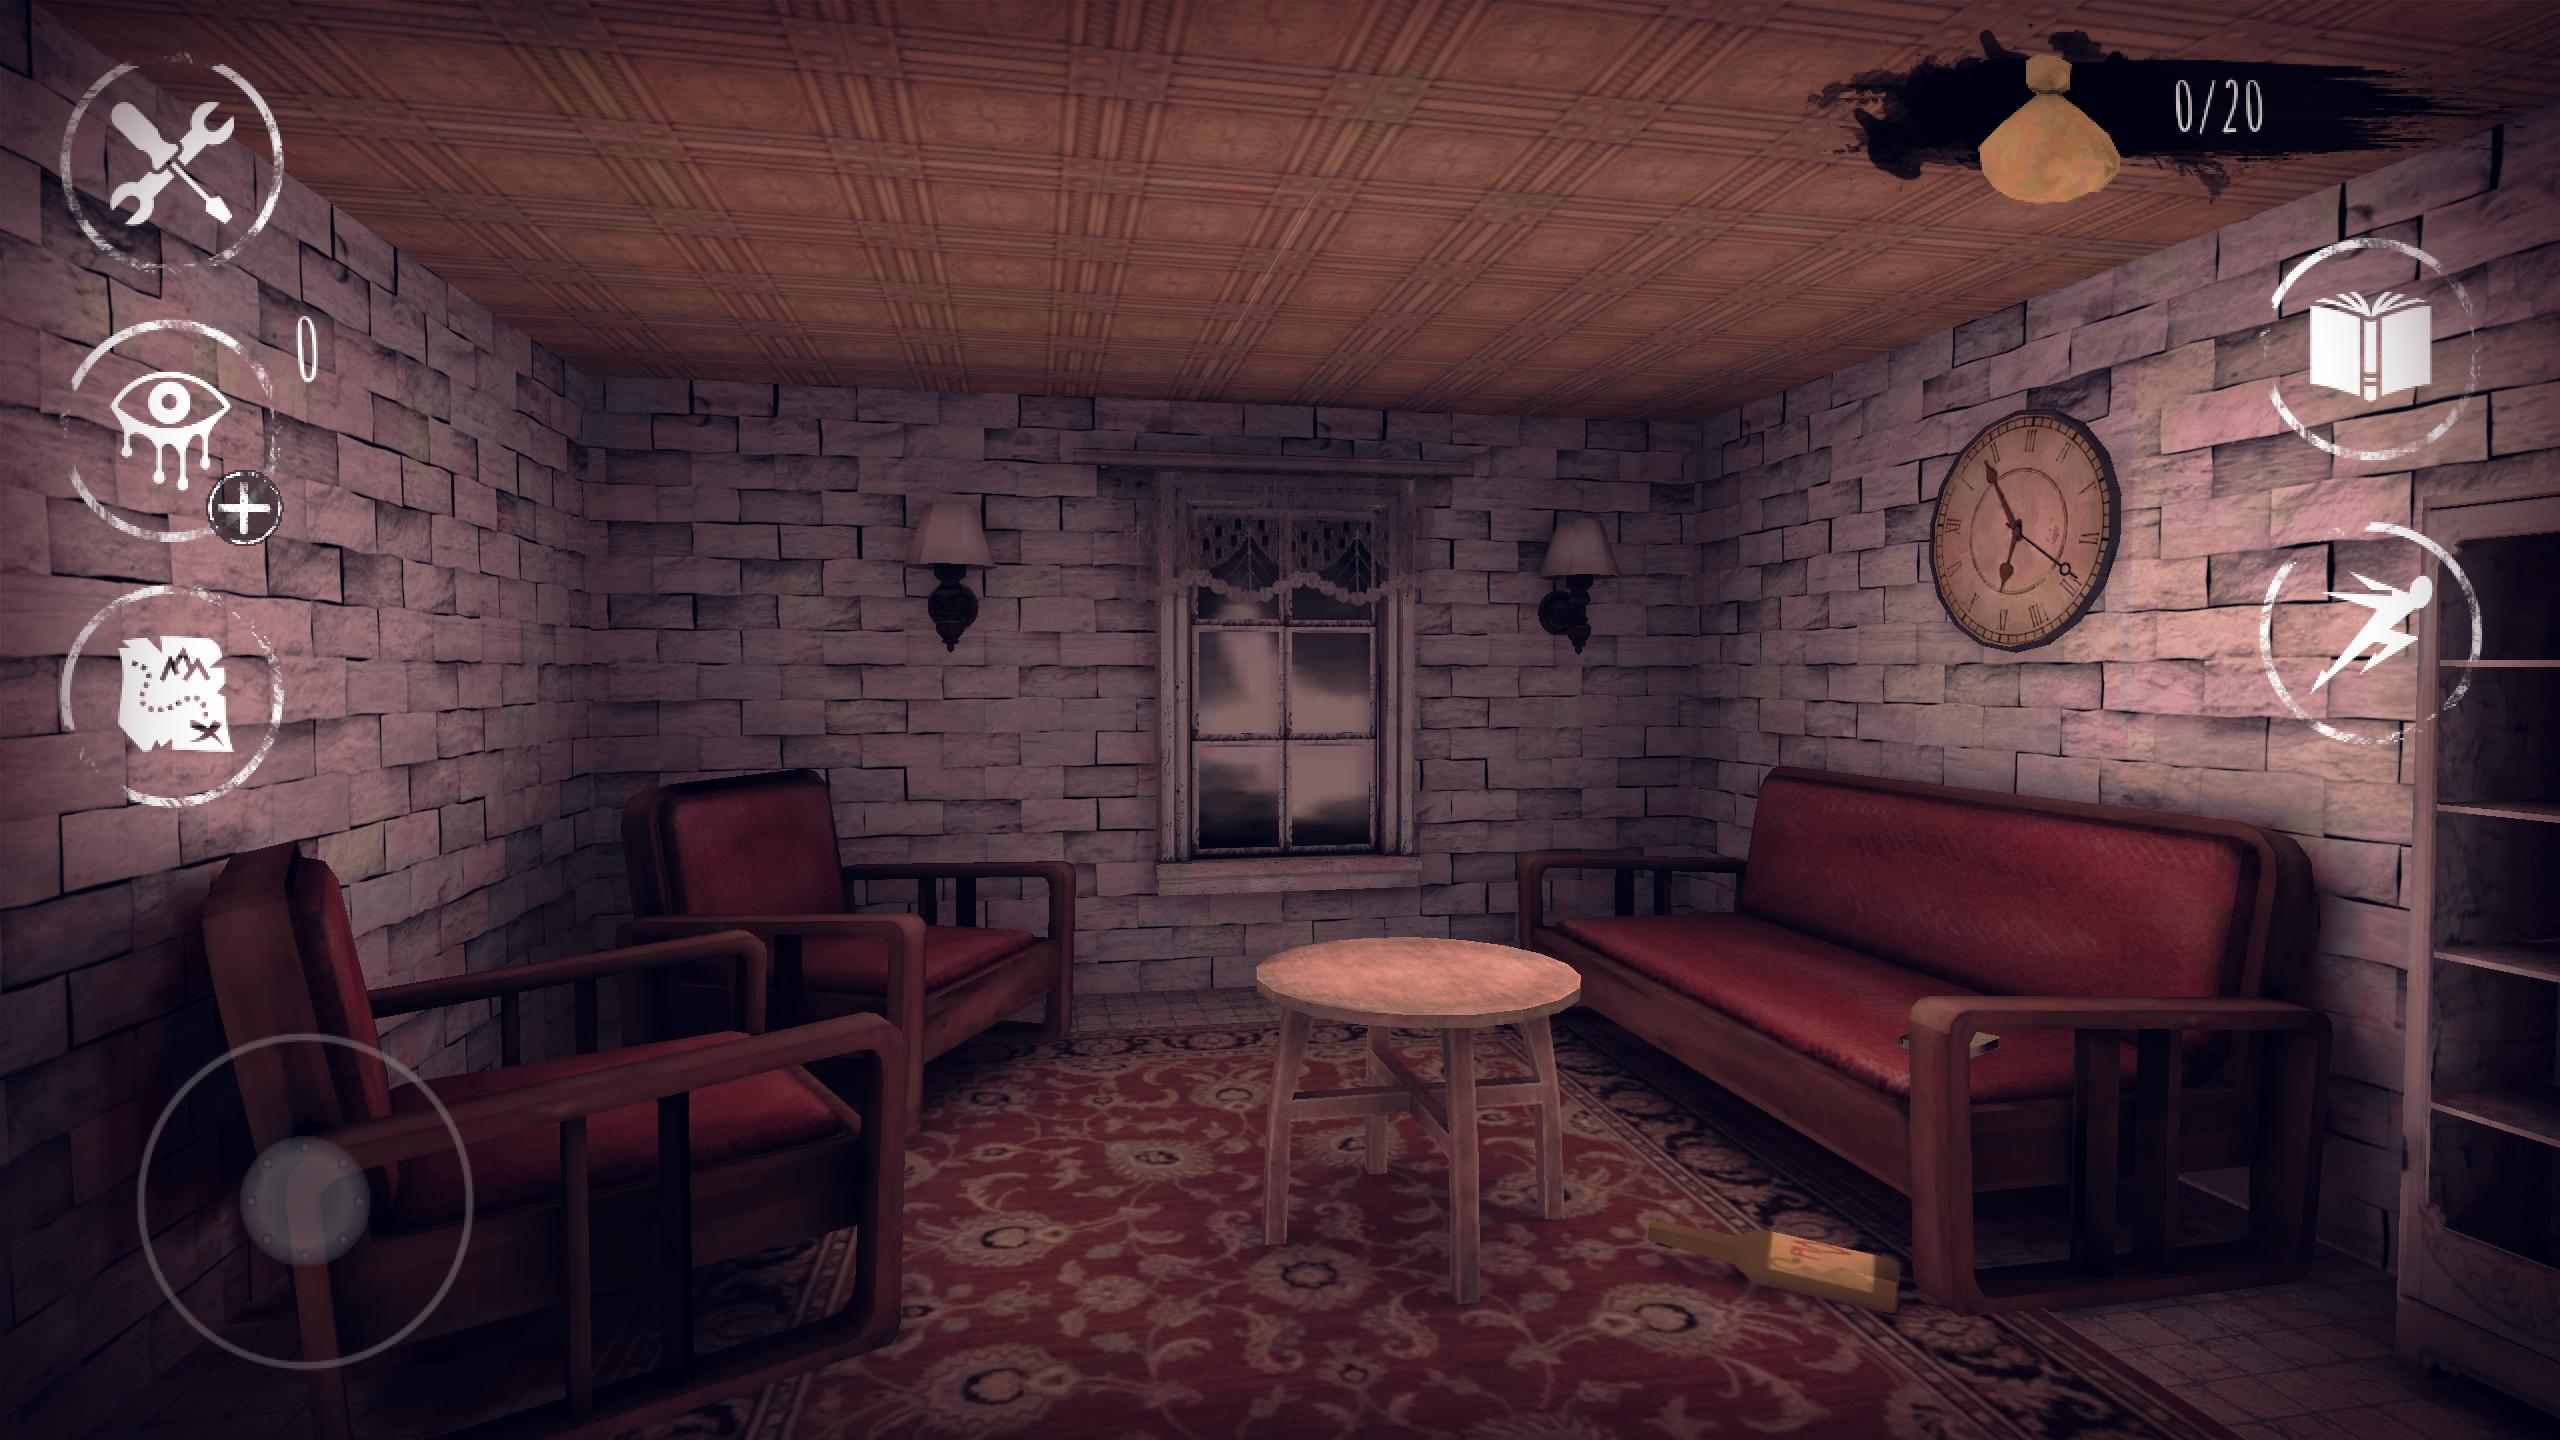 Eyes: Scary Thriller - Creepy Horror Game 6.1.1 Screenshot 5